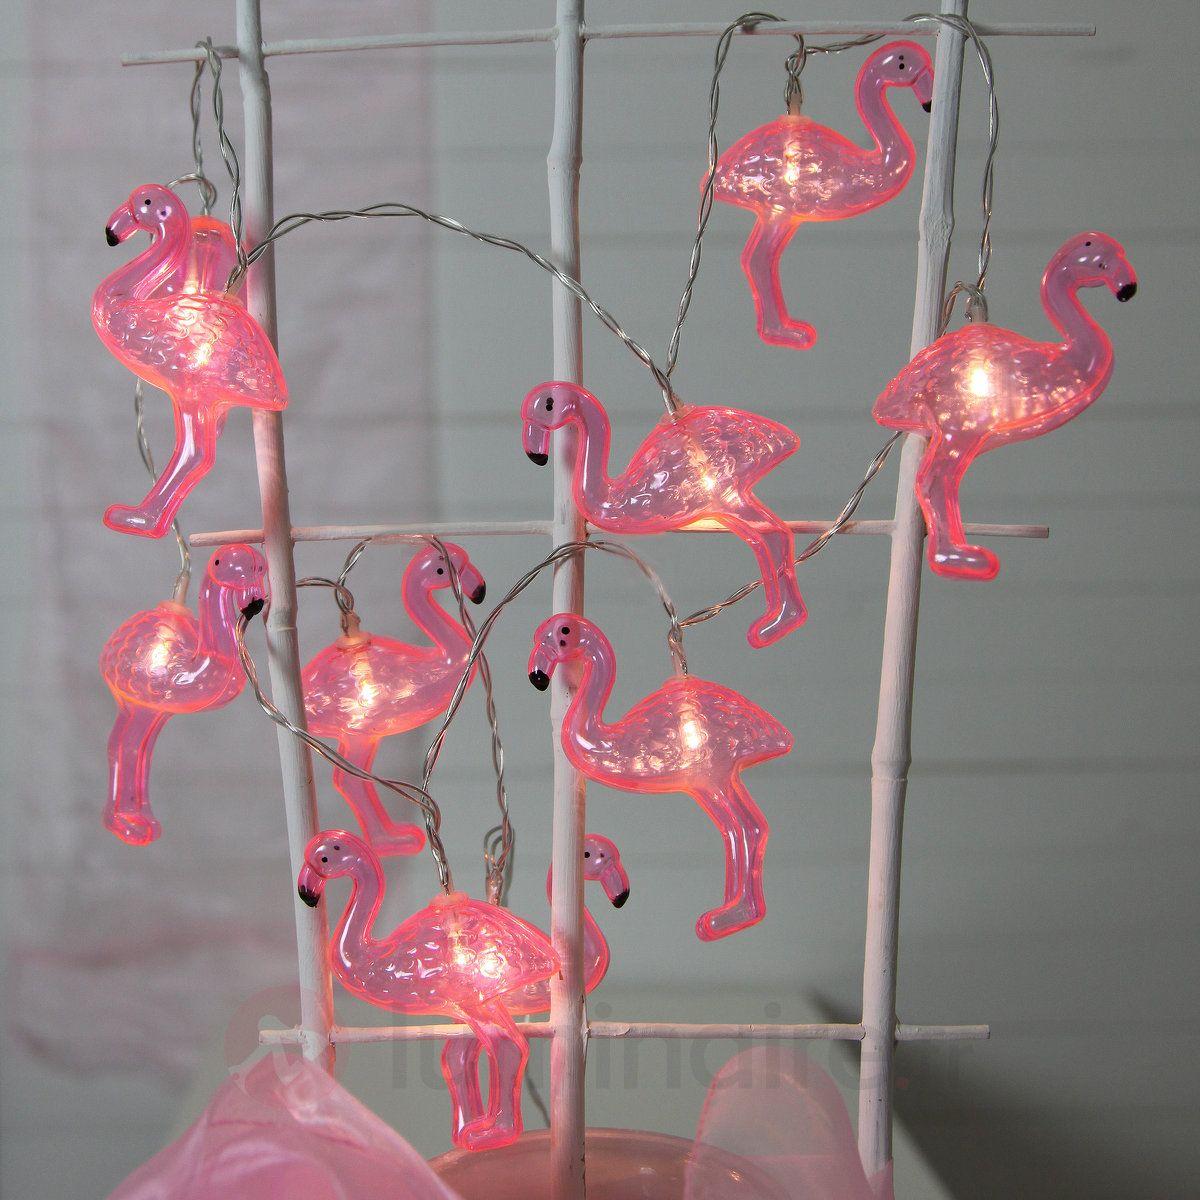 Guirlande Lumineuse Flamant Rose A 10 Lampes Led Guirlande Lumineuse Decoration Lumineuse Lampe Led